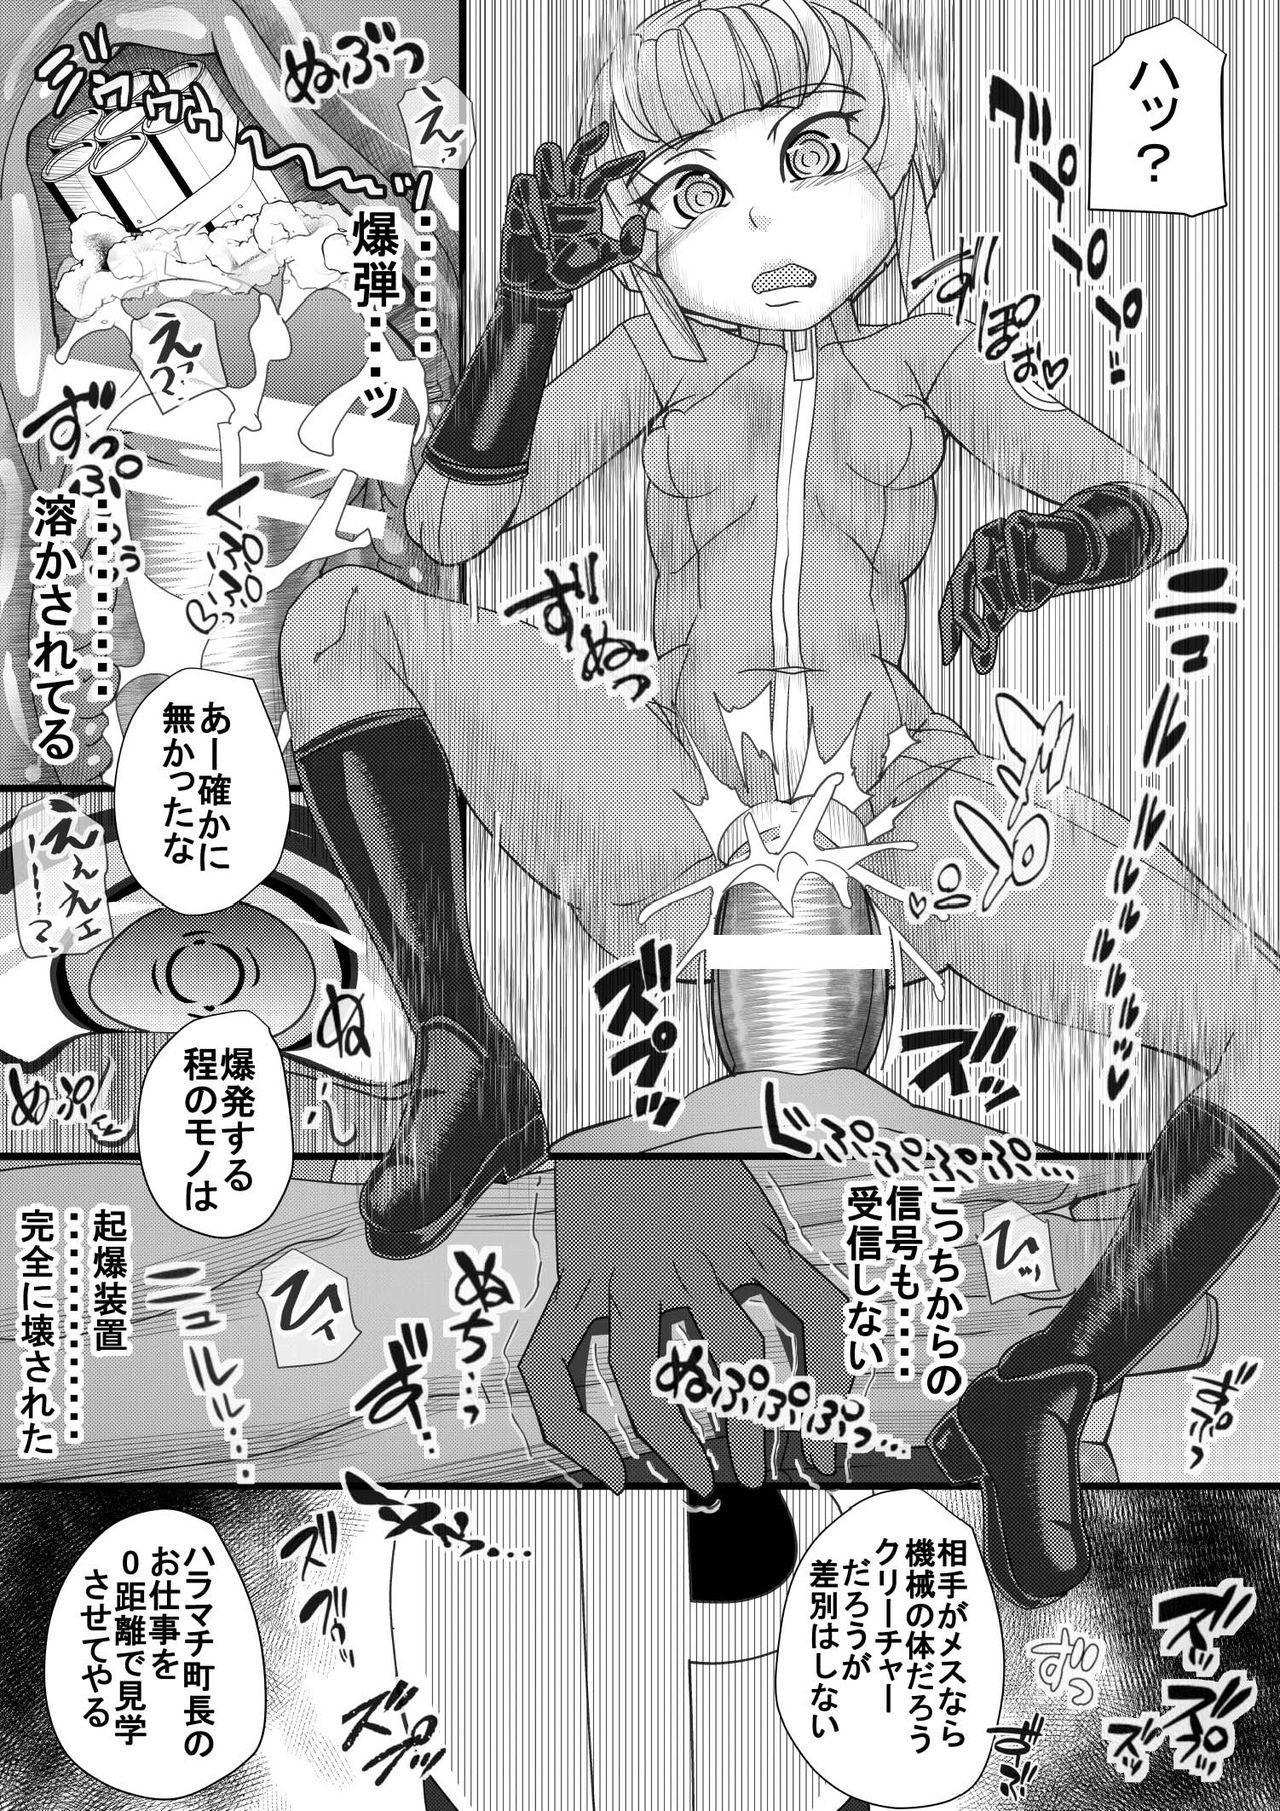 Haramachi 8 12